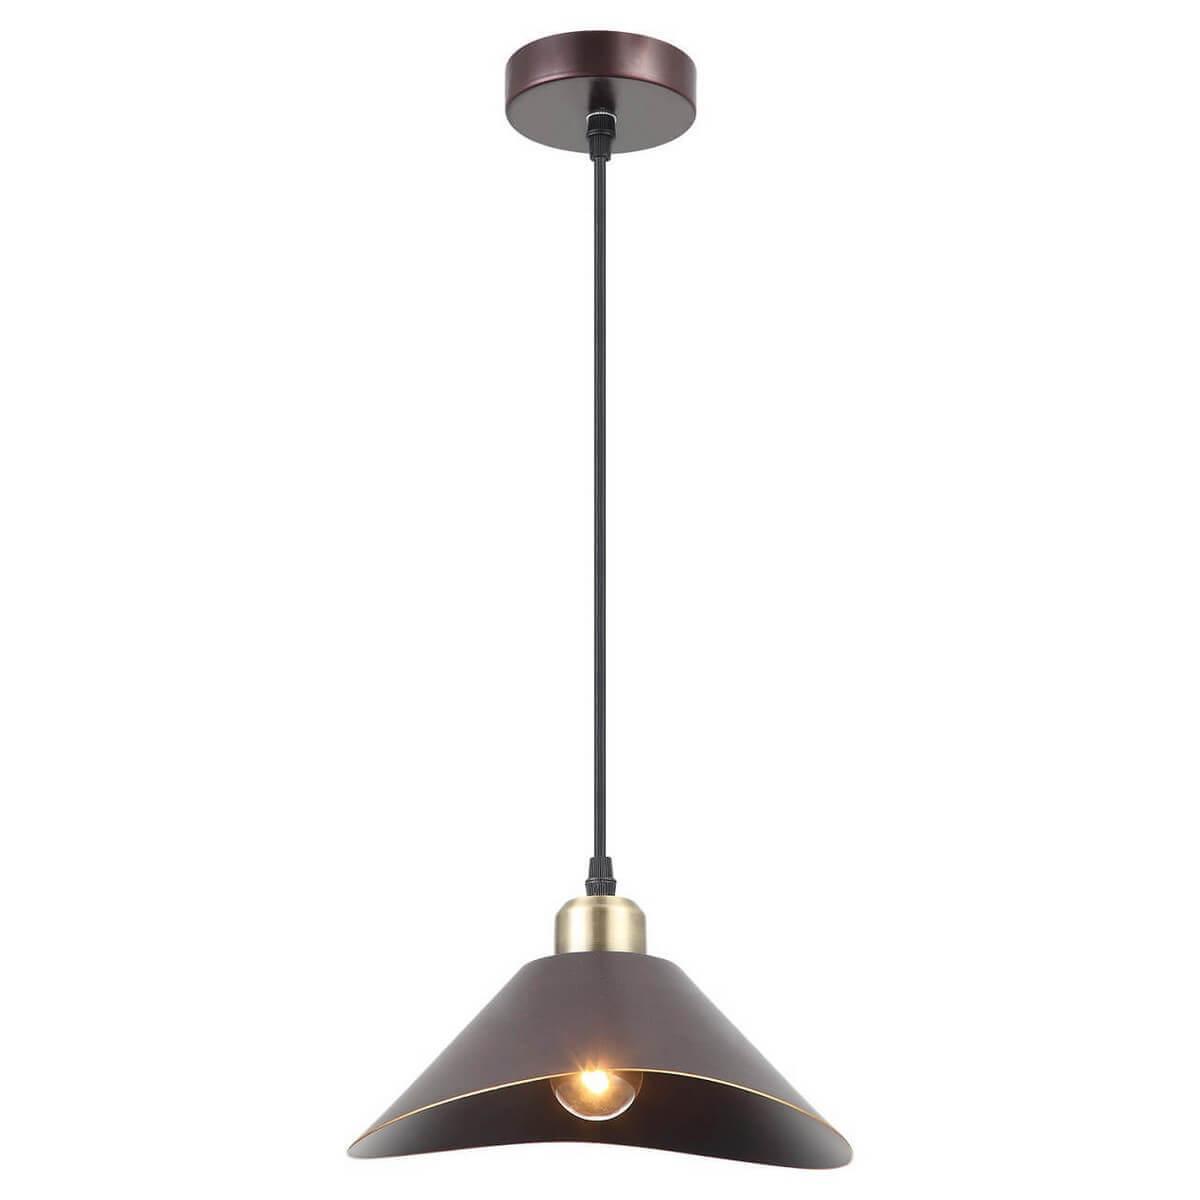 цена на Светильник Lussole LOFT LSP-9533 LSP-9533